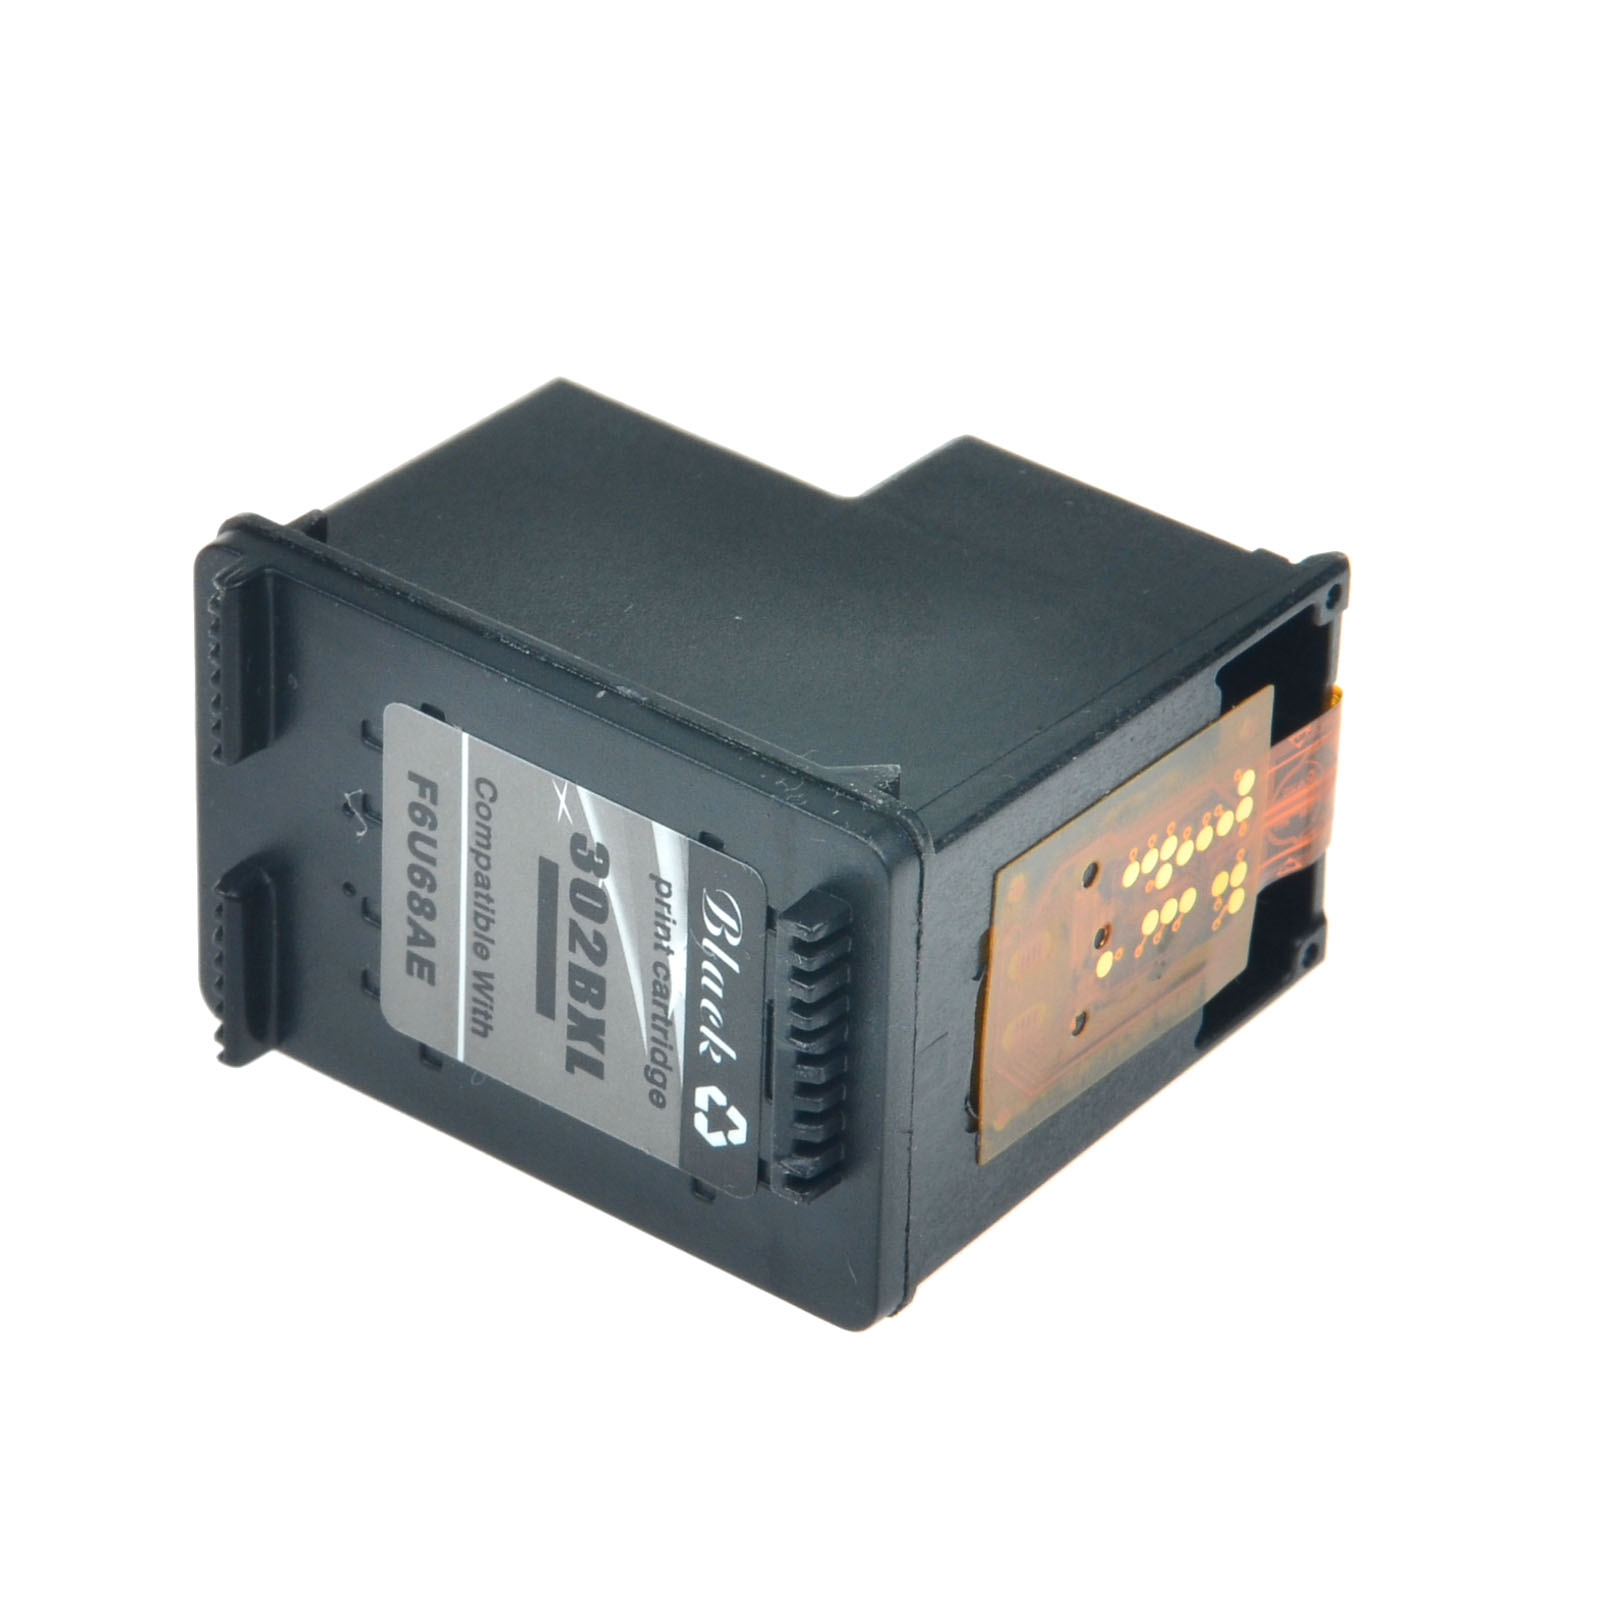 5PK-Black-Ink-Cartridge-Compatible-for-HP-302XL-DeskJet-1110-2130-2132-3636-3637 thumbnail 4